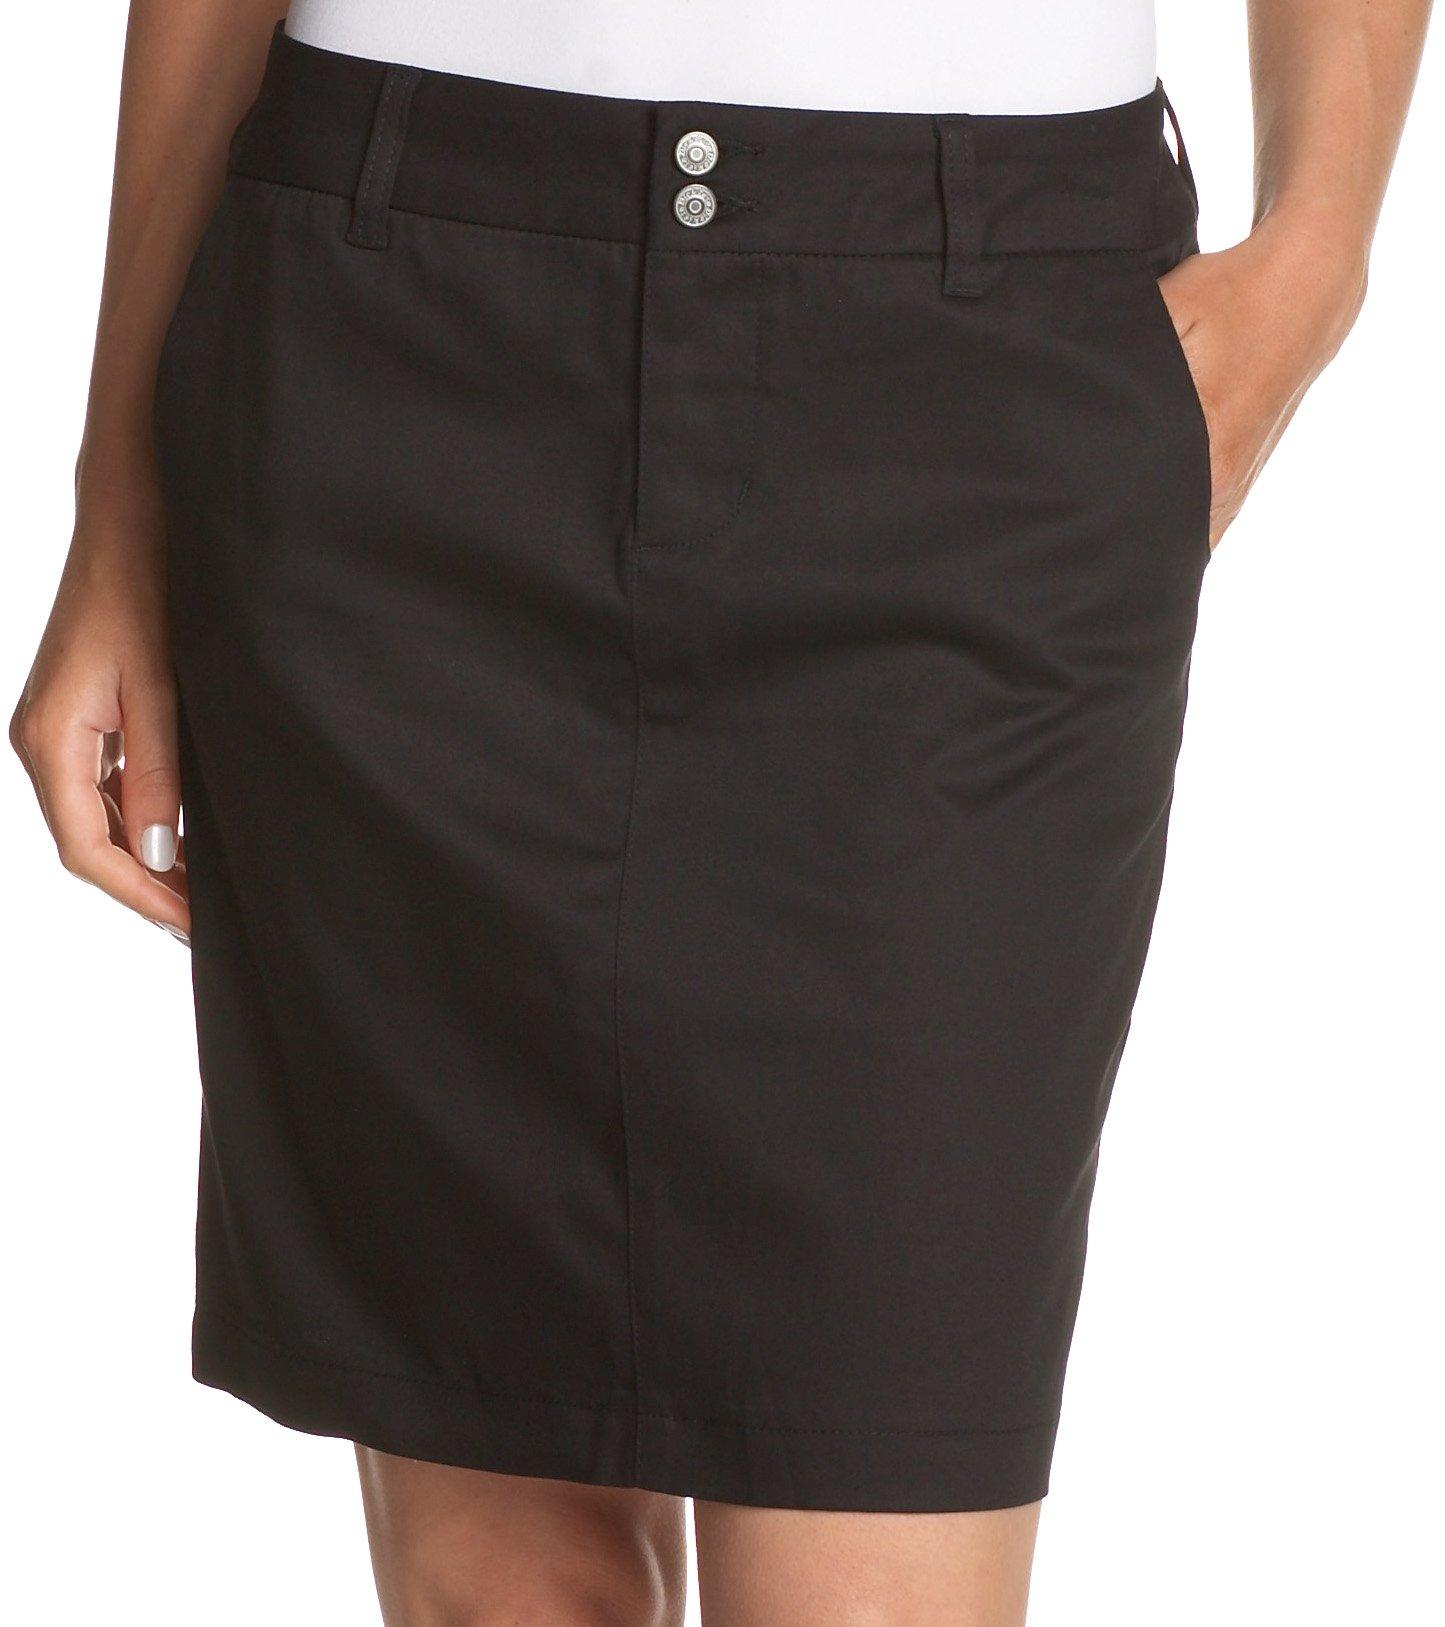 Dickies Girl Juniors 18'' 4 Pocket Double Button Skirt,Black,3 by Dickies Girl